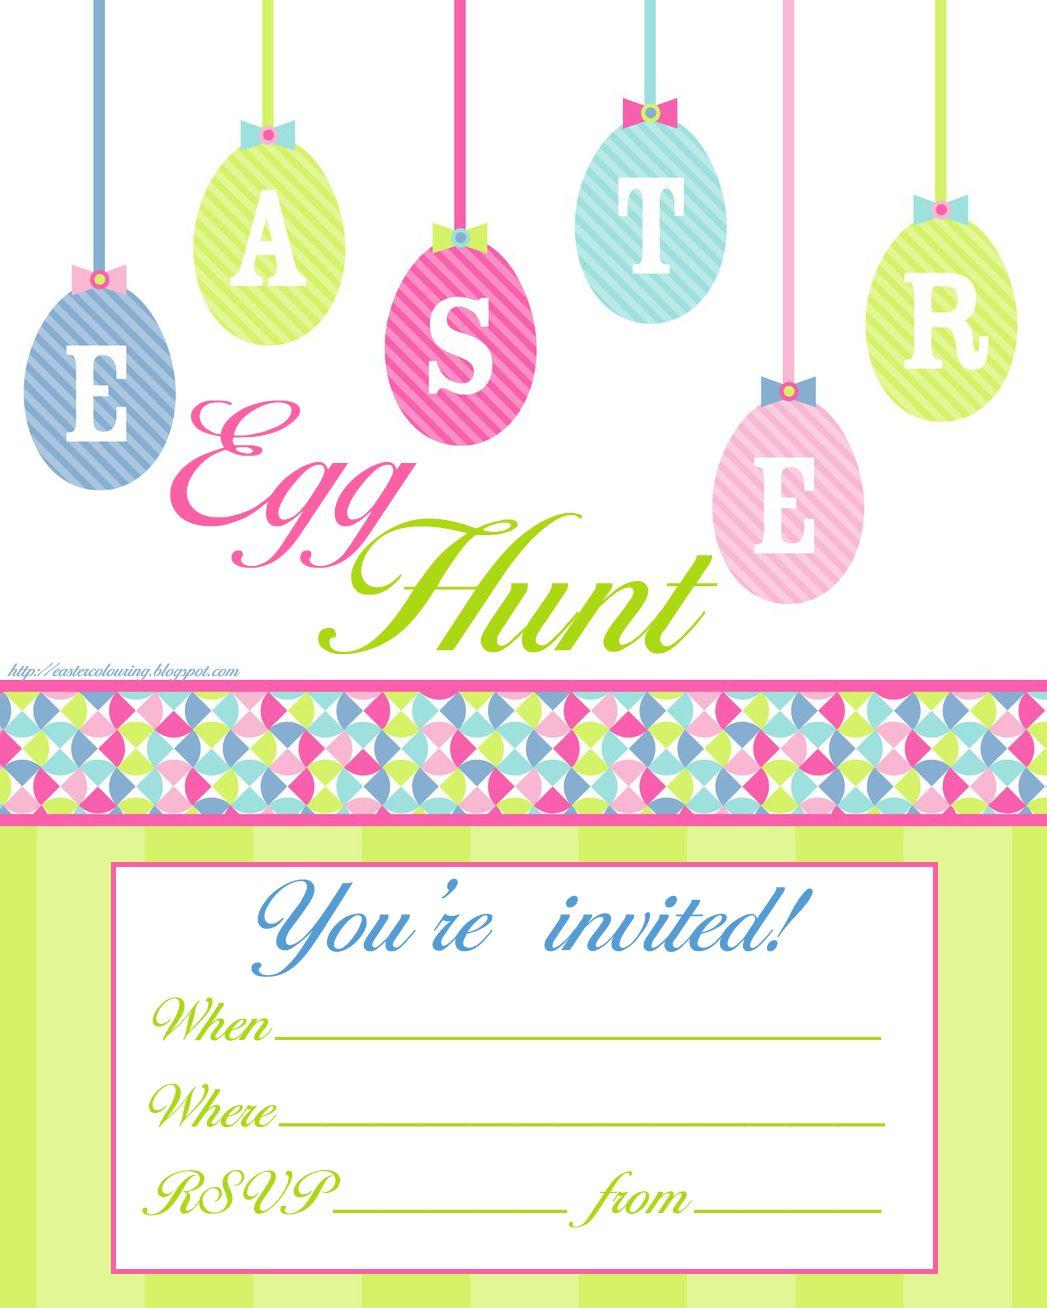 Easter Egg Hunt Free Printable Invitation